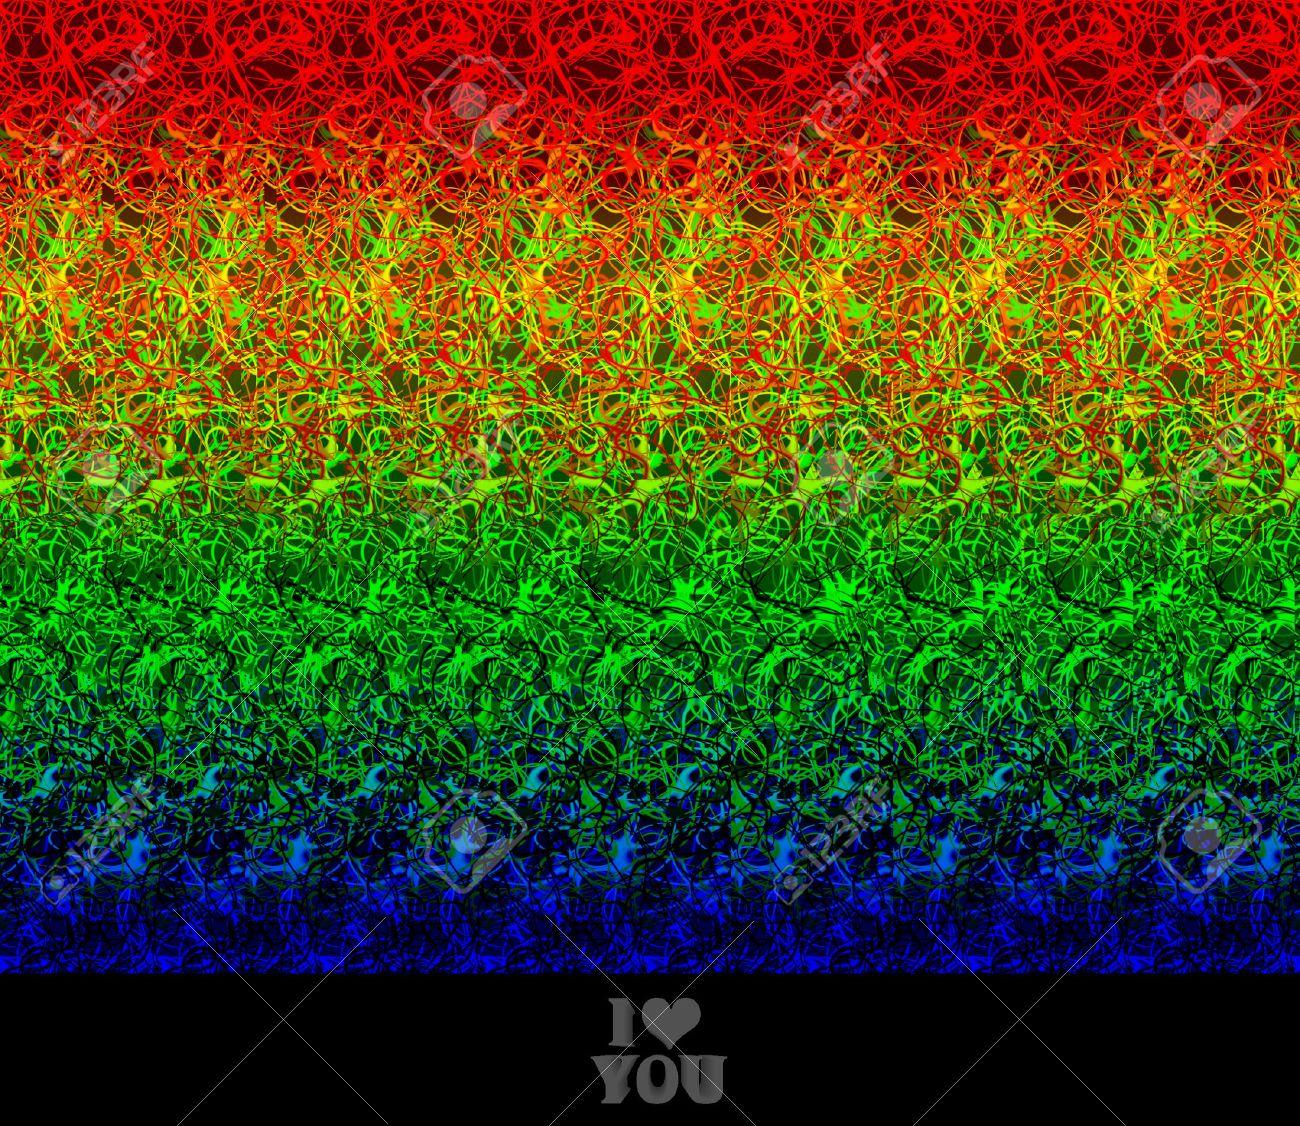 Valentine Greeting I Love You Stereogram Autostereogram Creates